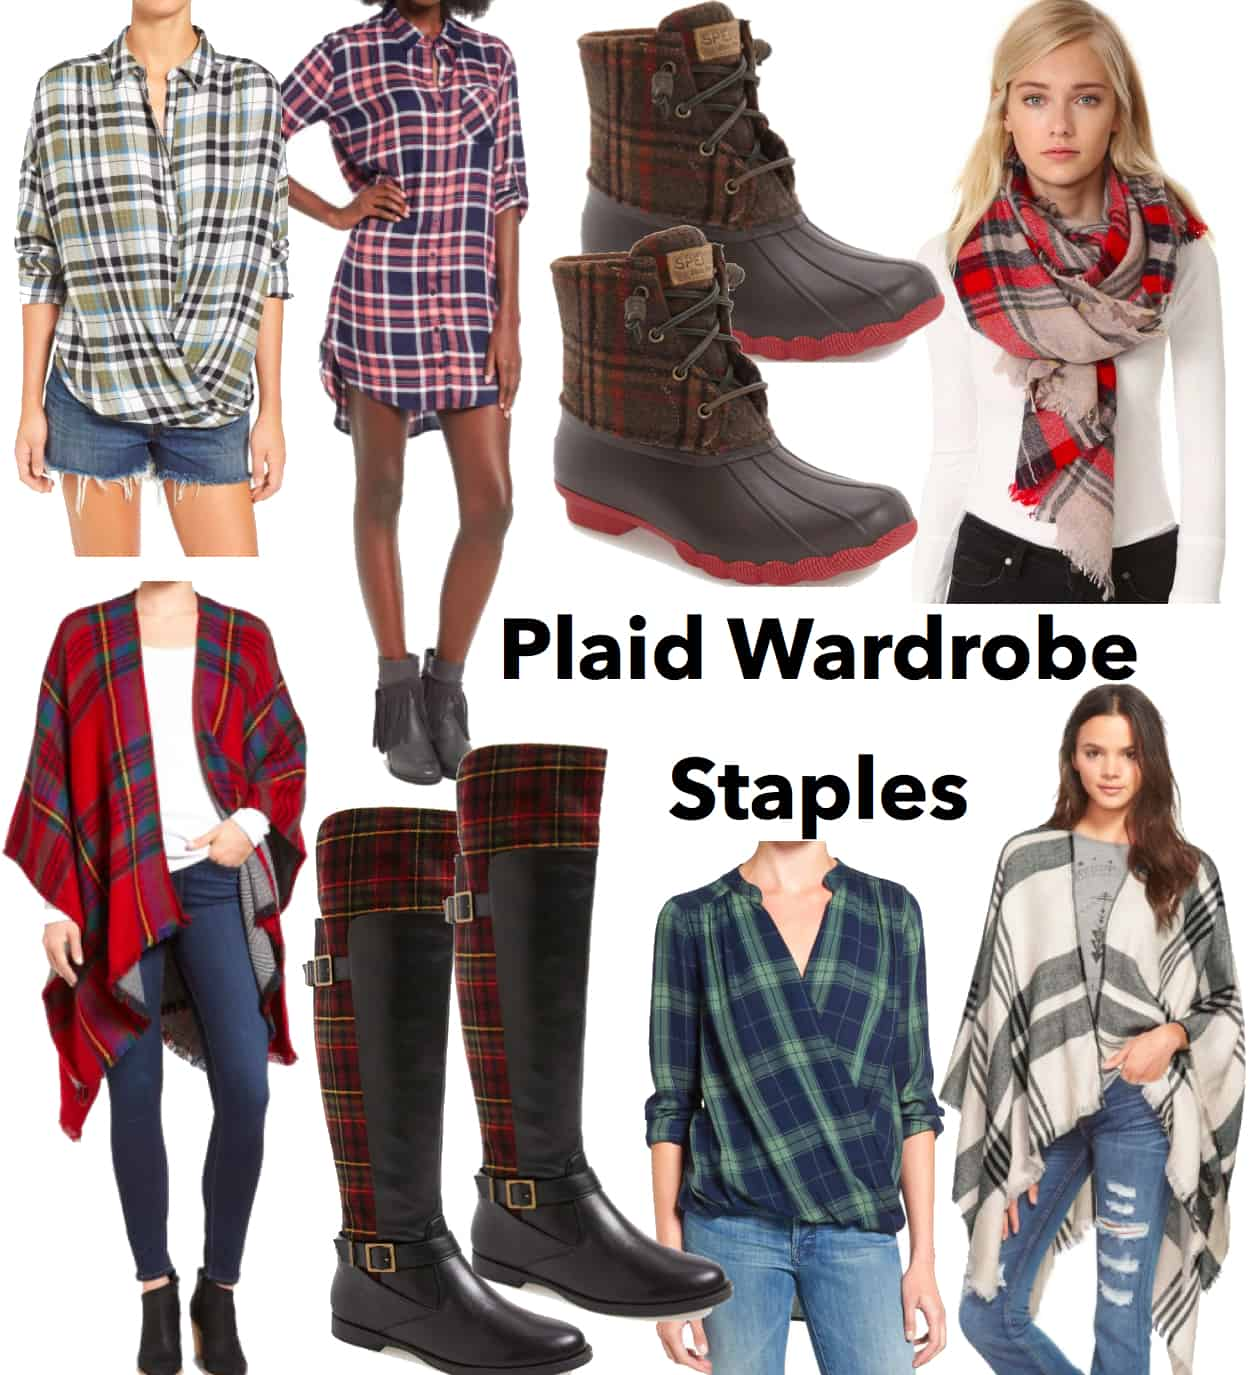 Plaid Wardrobe Staples